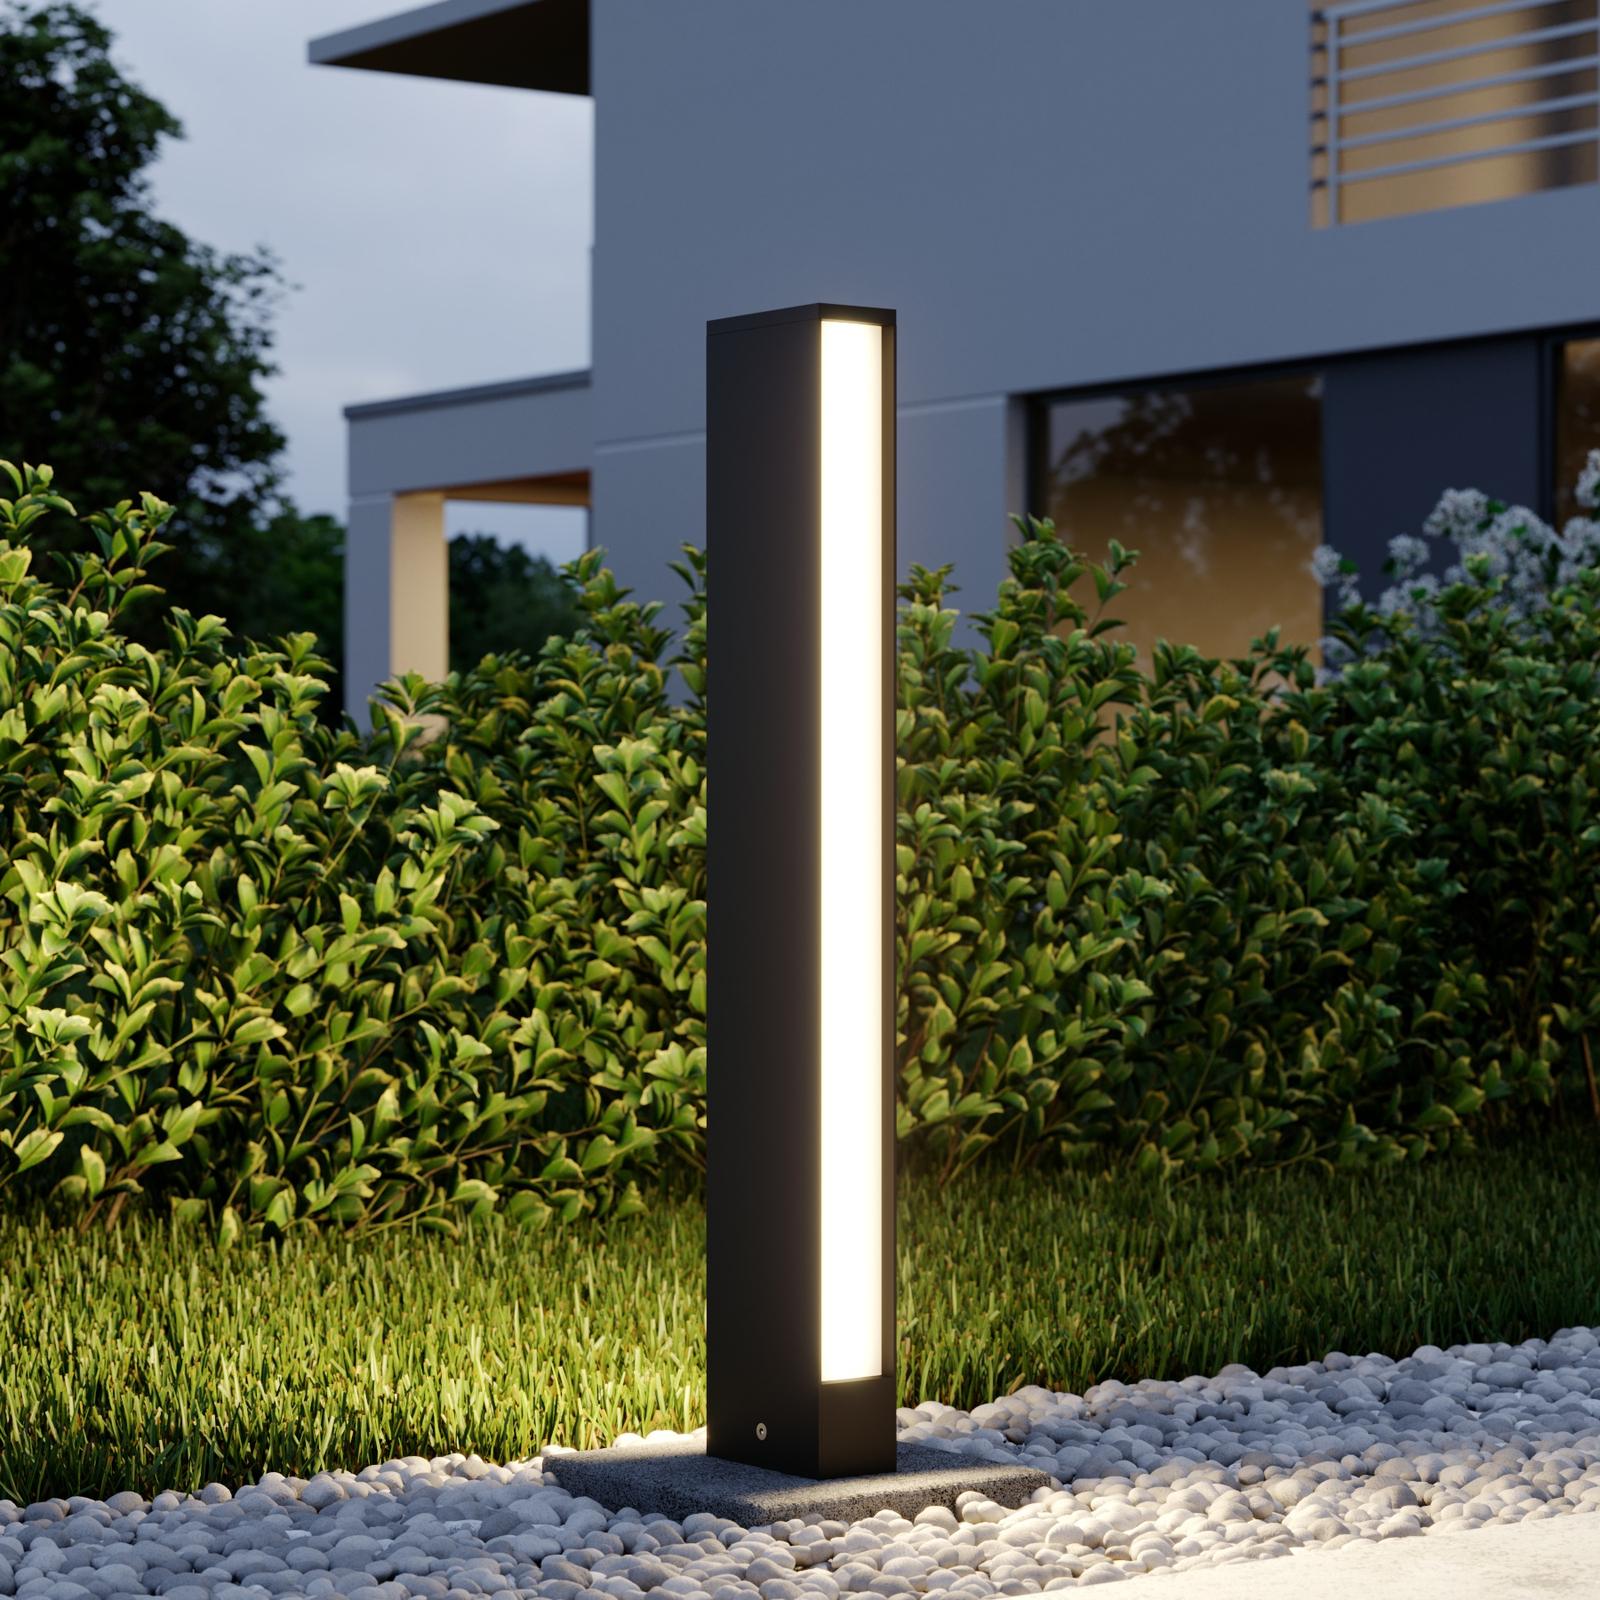 LED-Wegeleuchte Lirka, dunkelgrau, 2-flammig